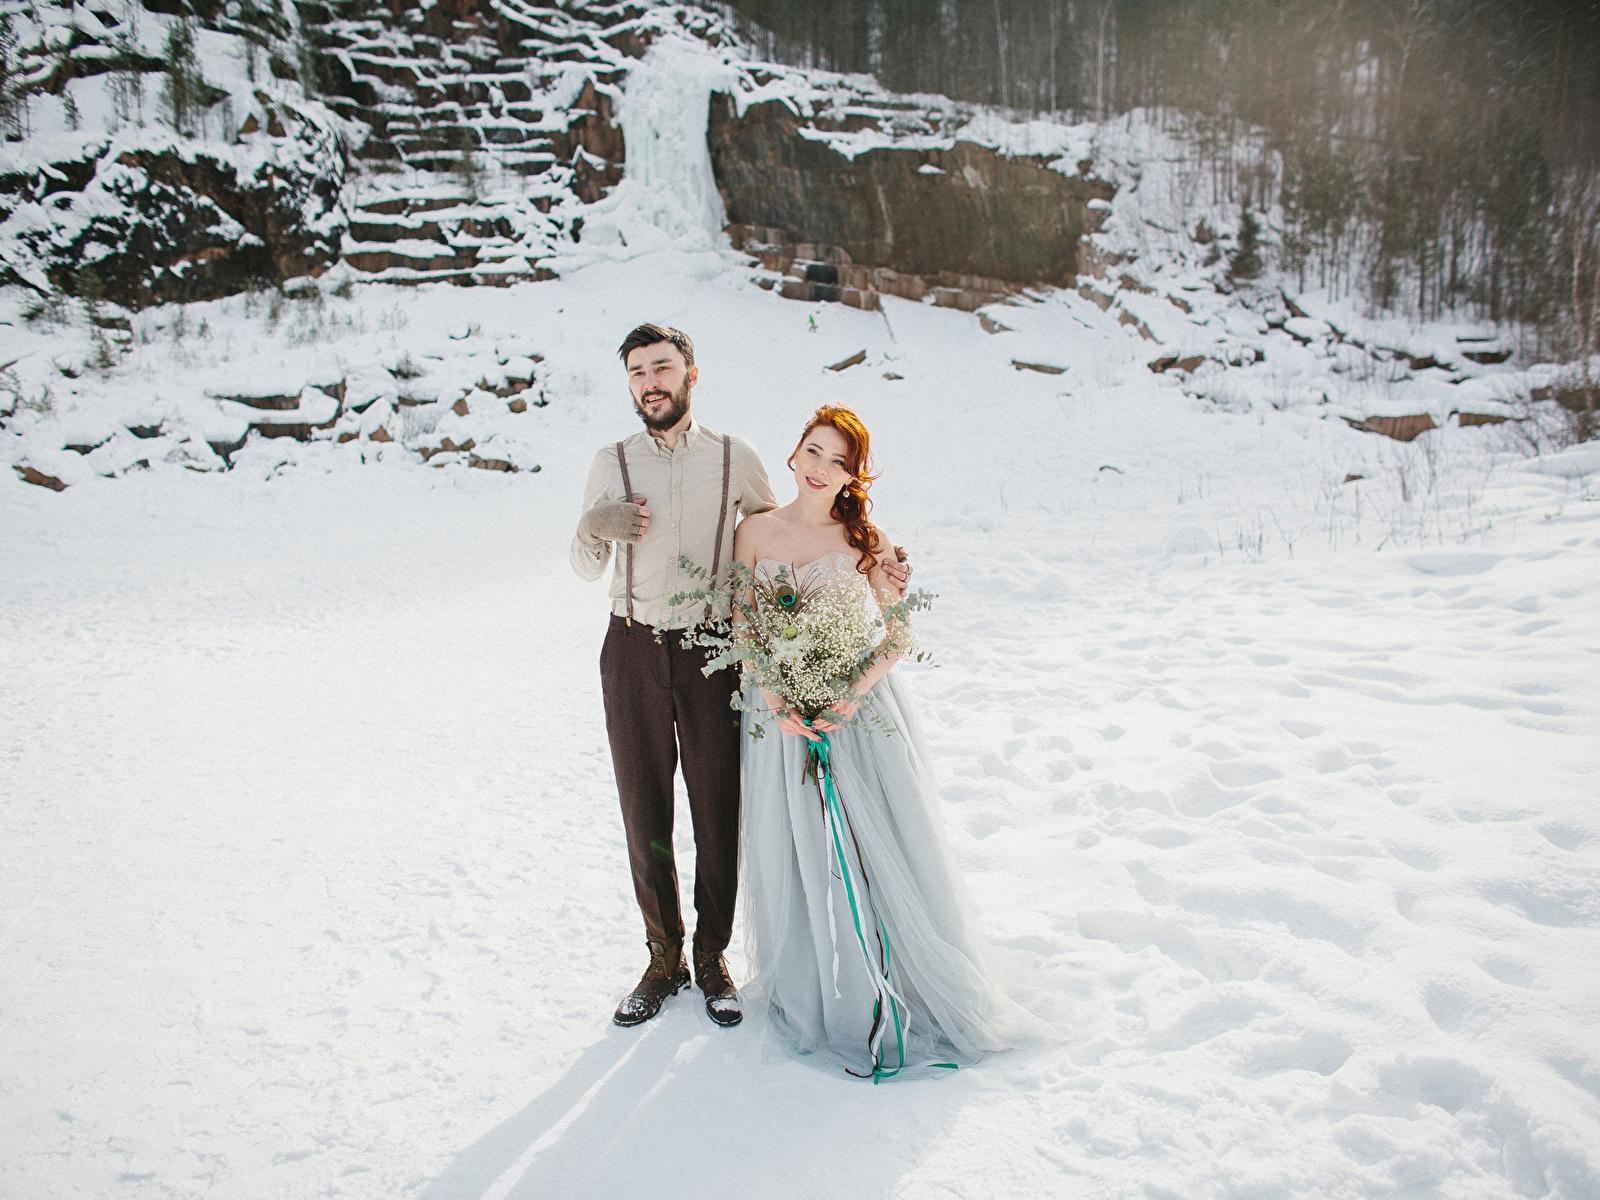 Fotos Bräutigam Braut Sträuße Liebe Winter Mädchens Kleid 1600x1200 bräute